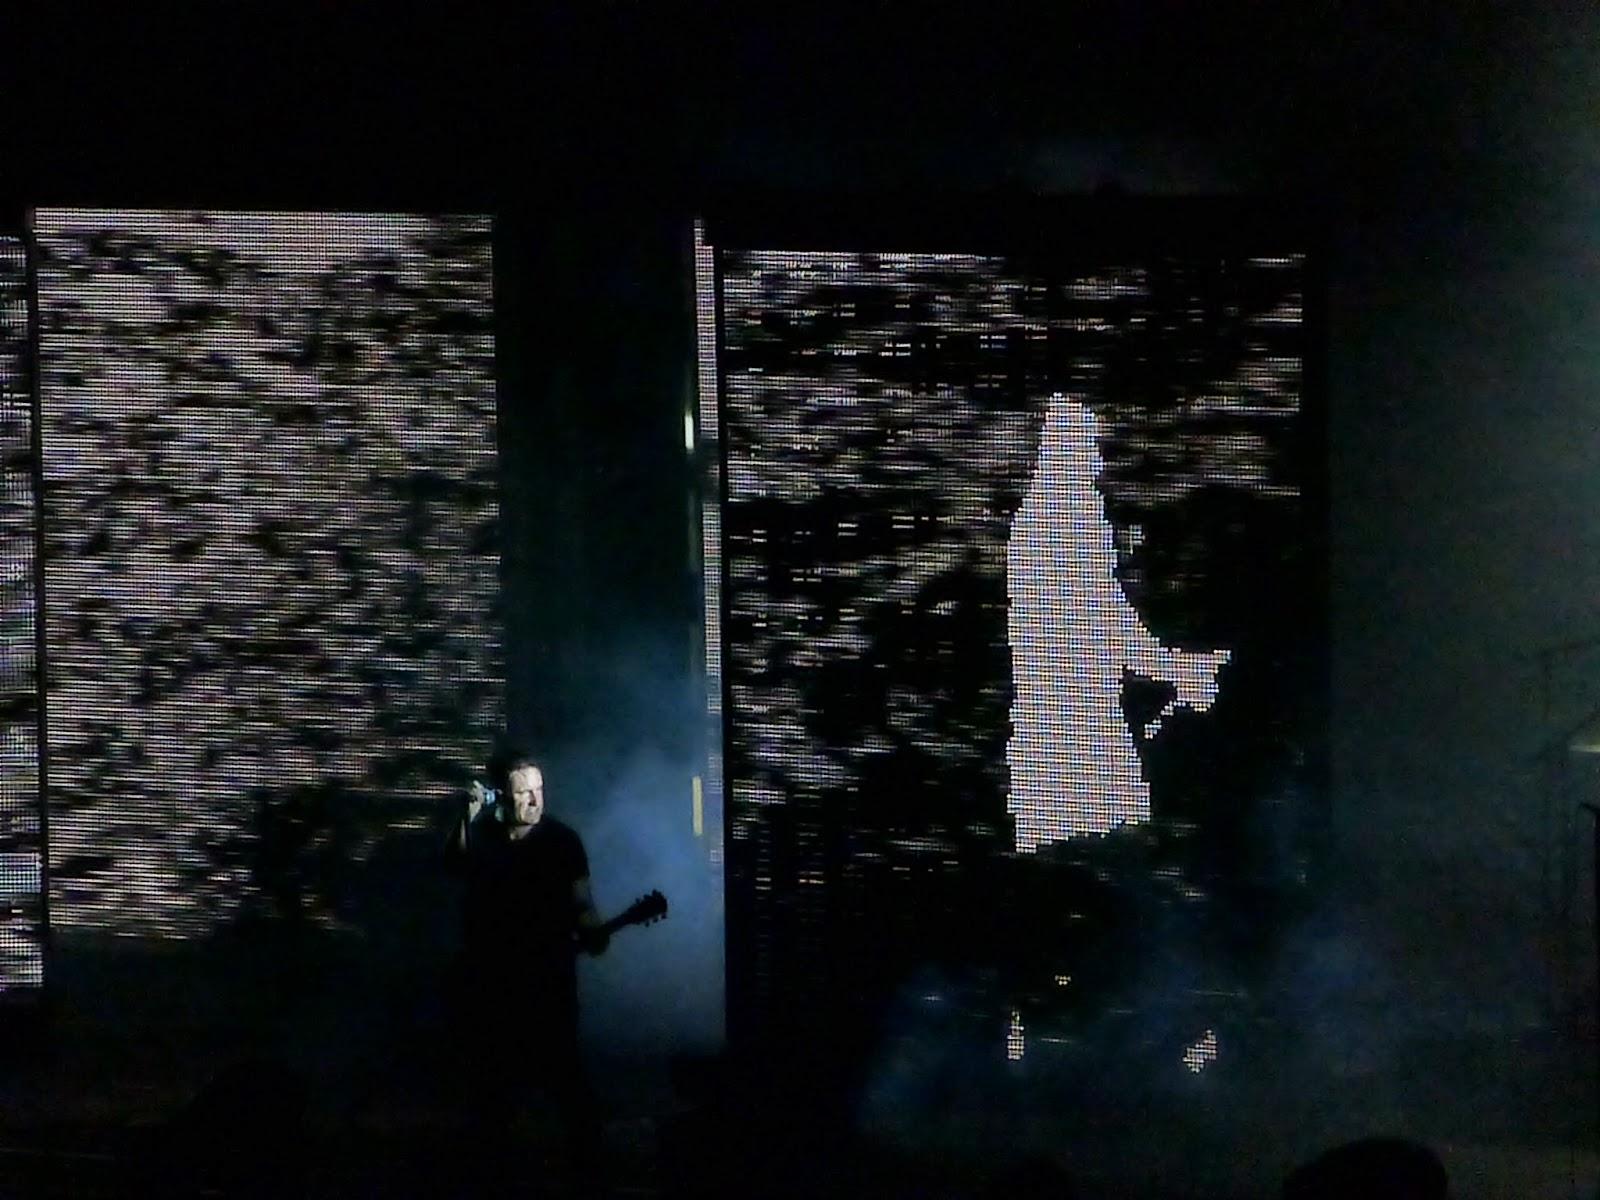 Flora Isadora: Camera Obscura